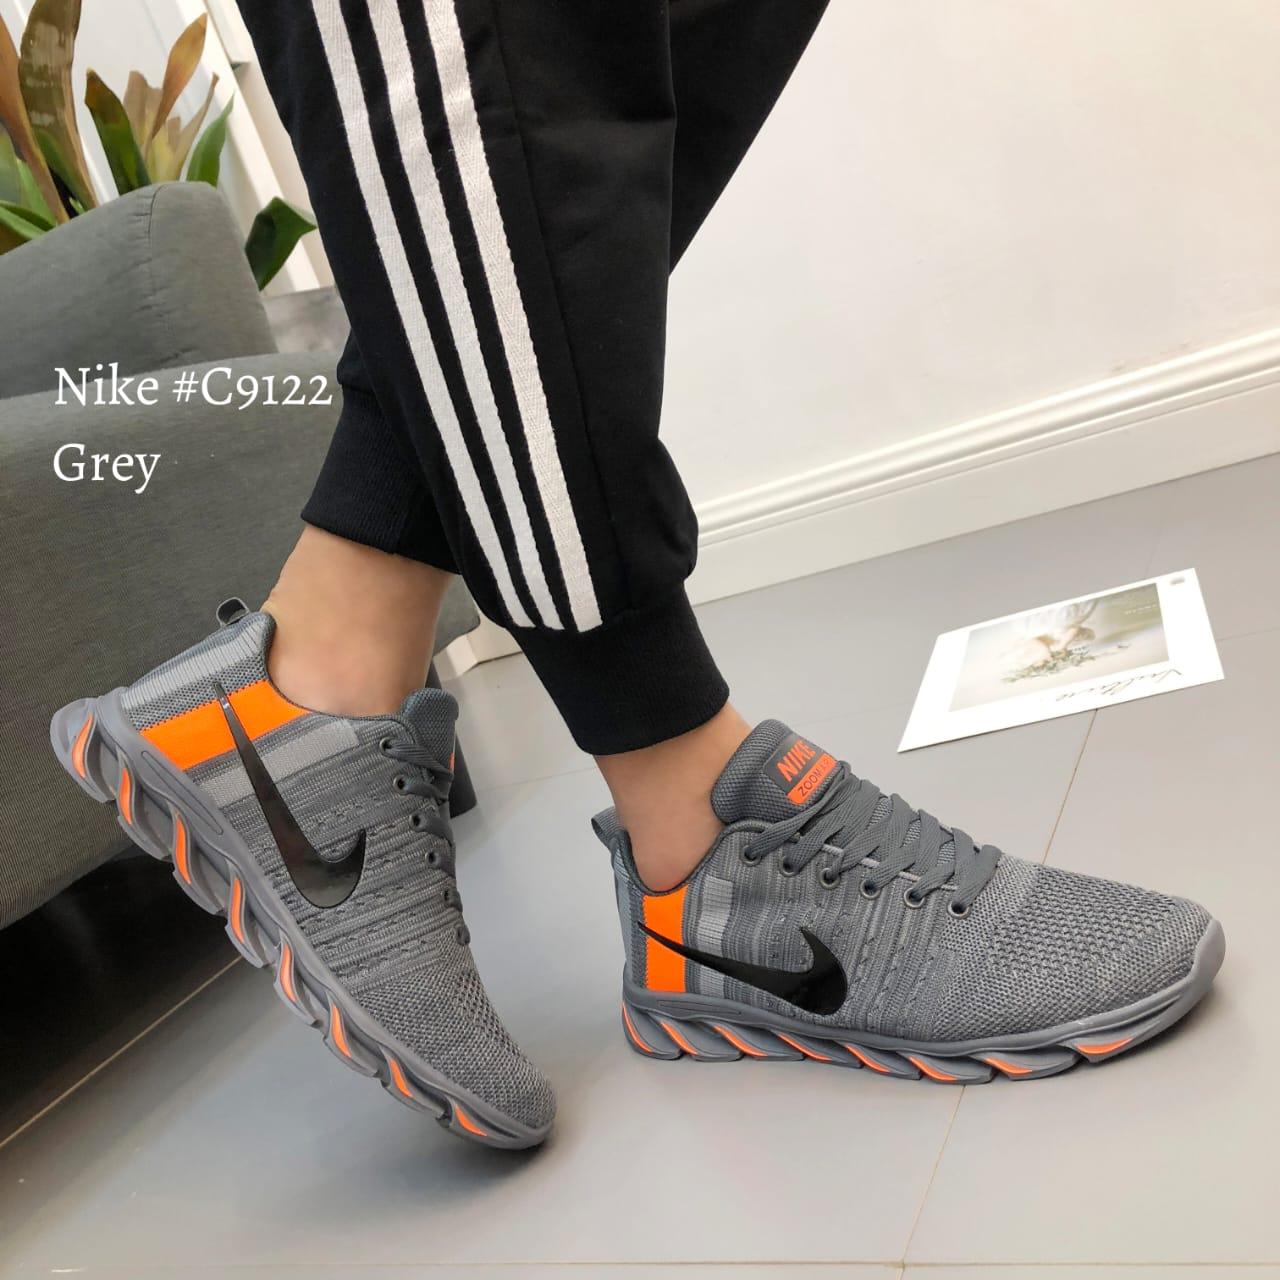 Sepatu sneakers import pria terbaru di indonesia C9122Gr